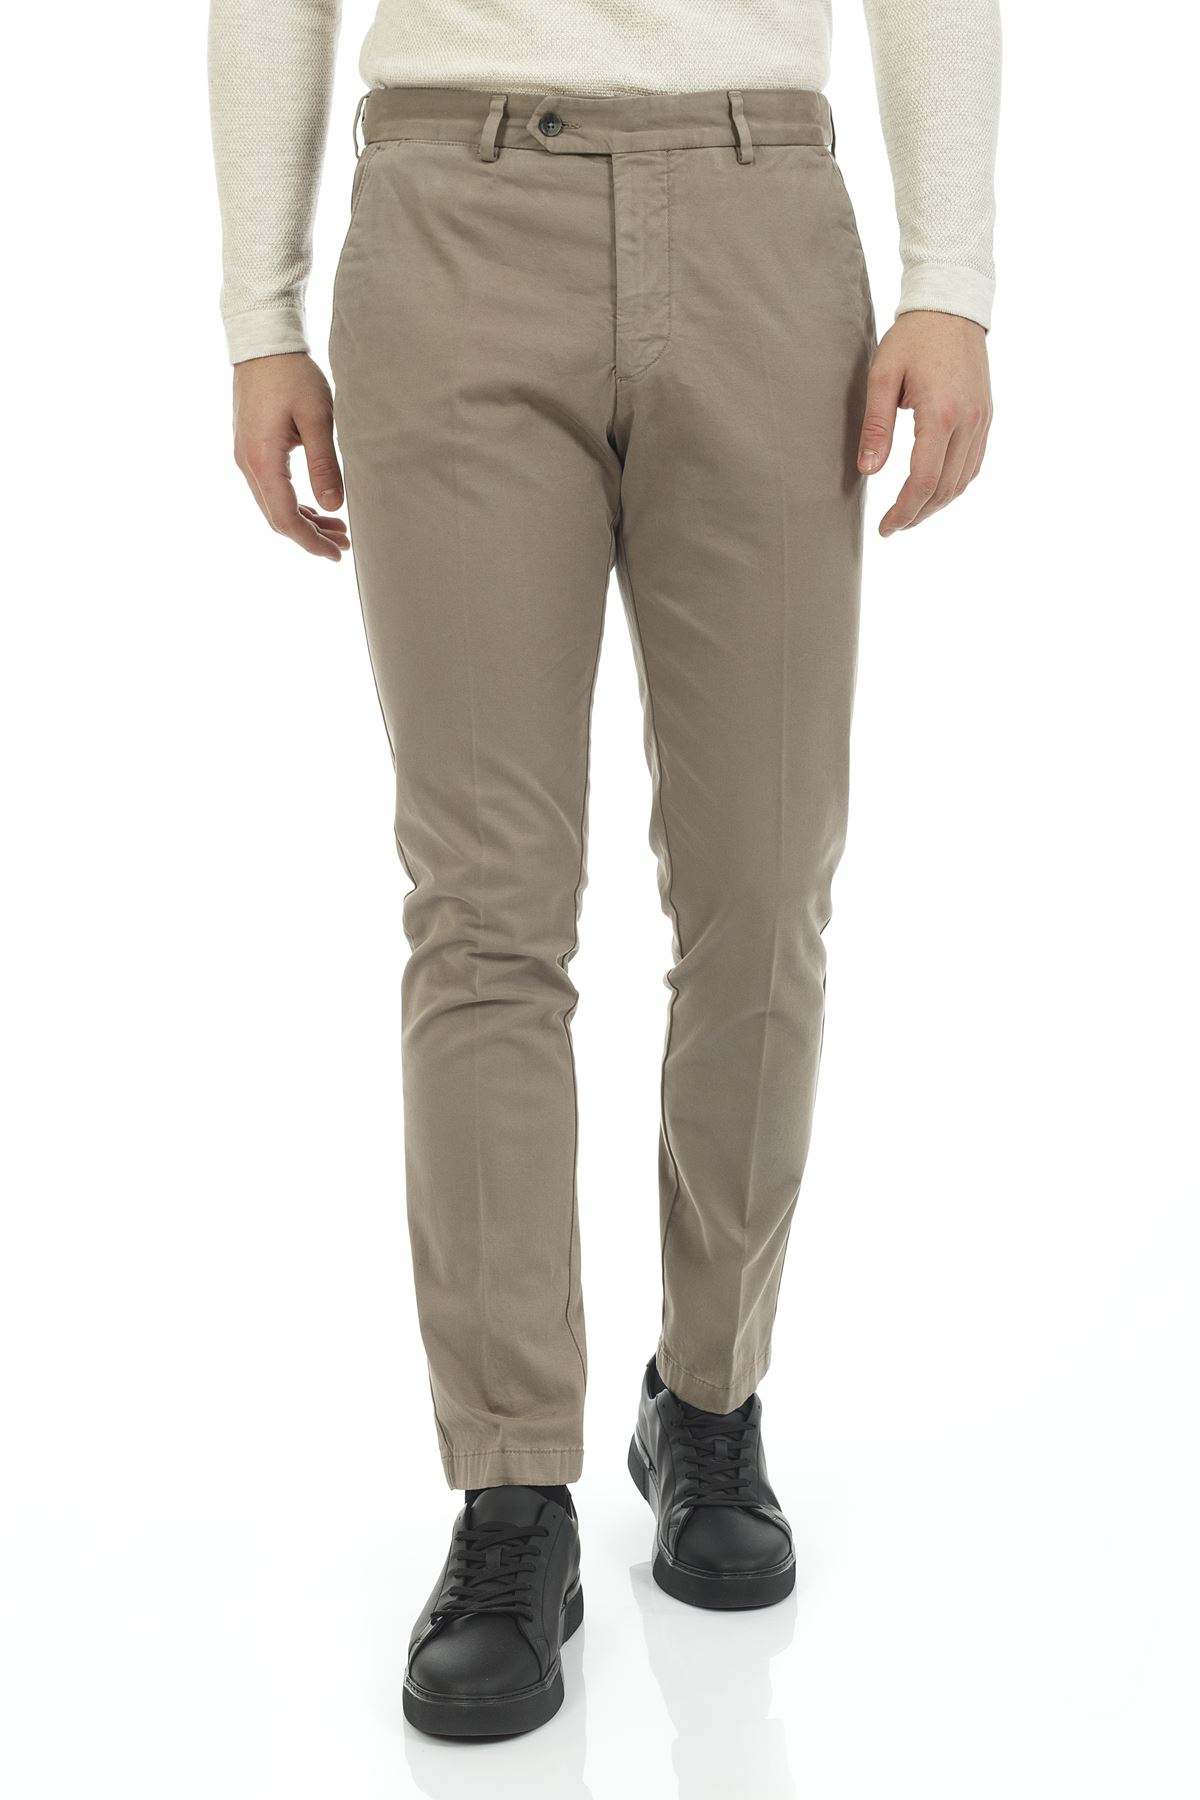 Vizon Dar Paça Slim Chino Pantolon